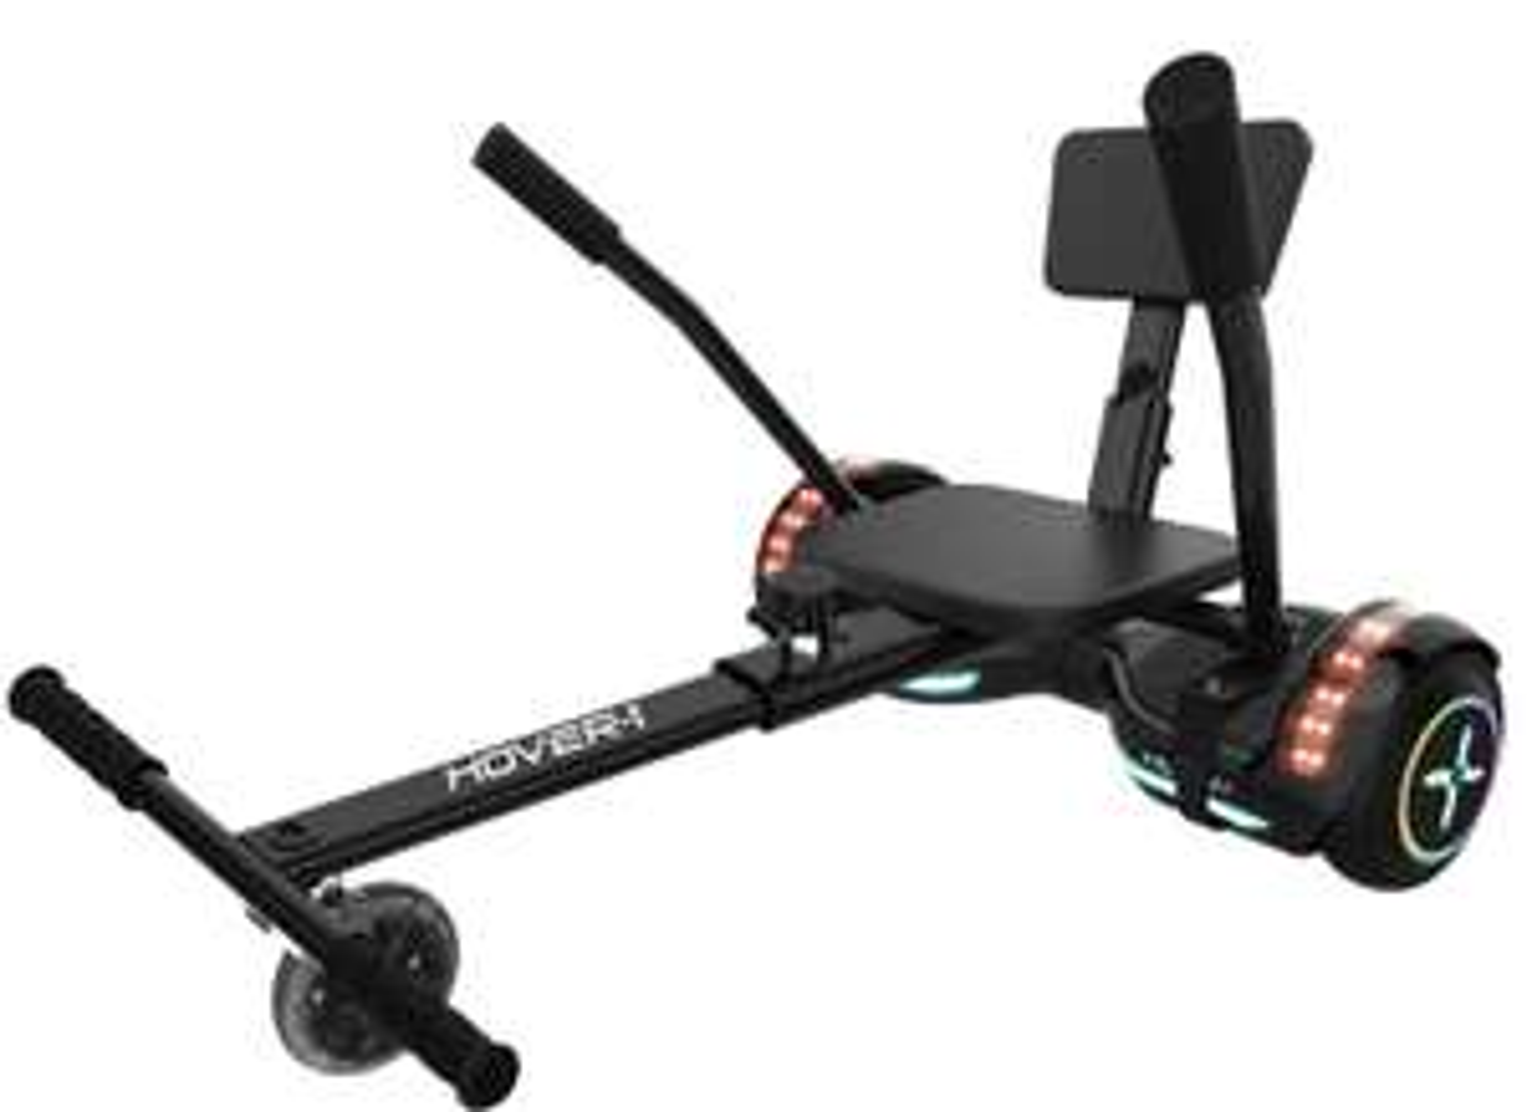 Hover-1 Matrix 6.5 Inch Wheel Buggy with Bluetooth Speaker £139.99 at Argos plus 15% back via Quidco